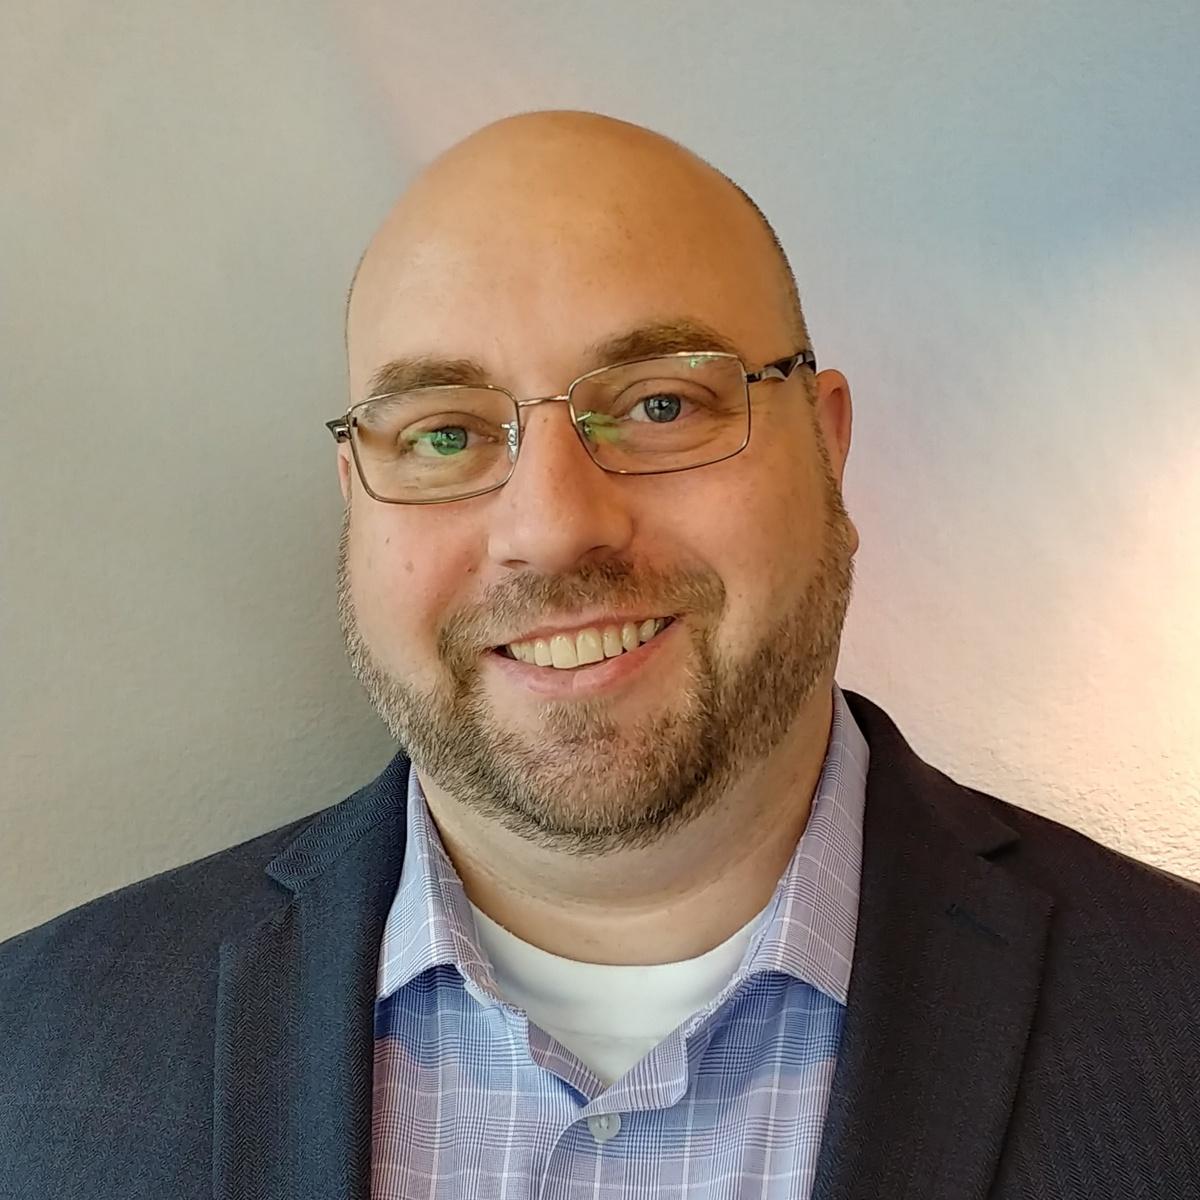 Contributor for FuzzCon 2020 - Terry McCorkle